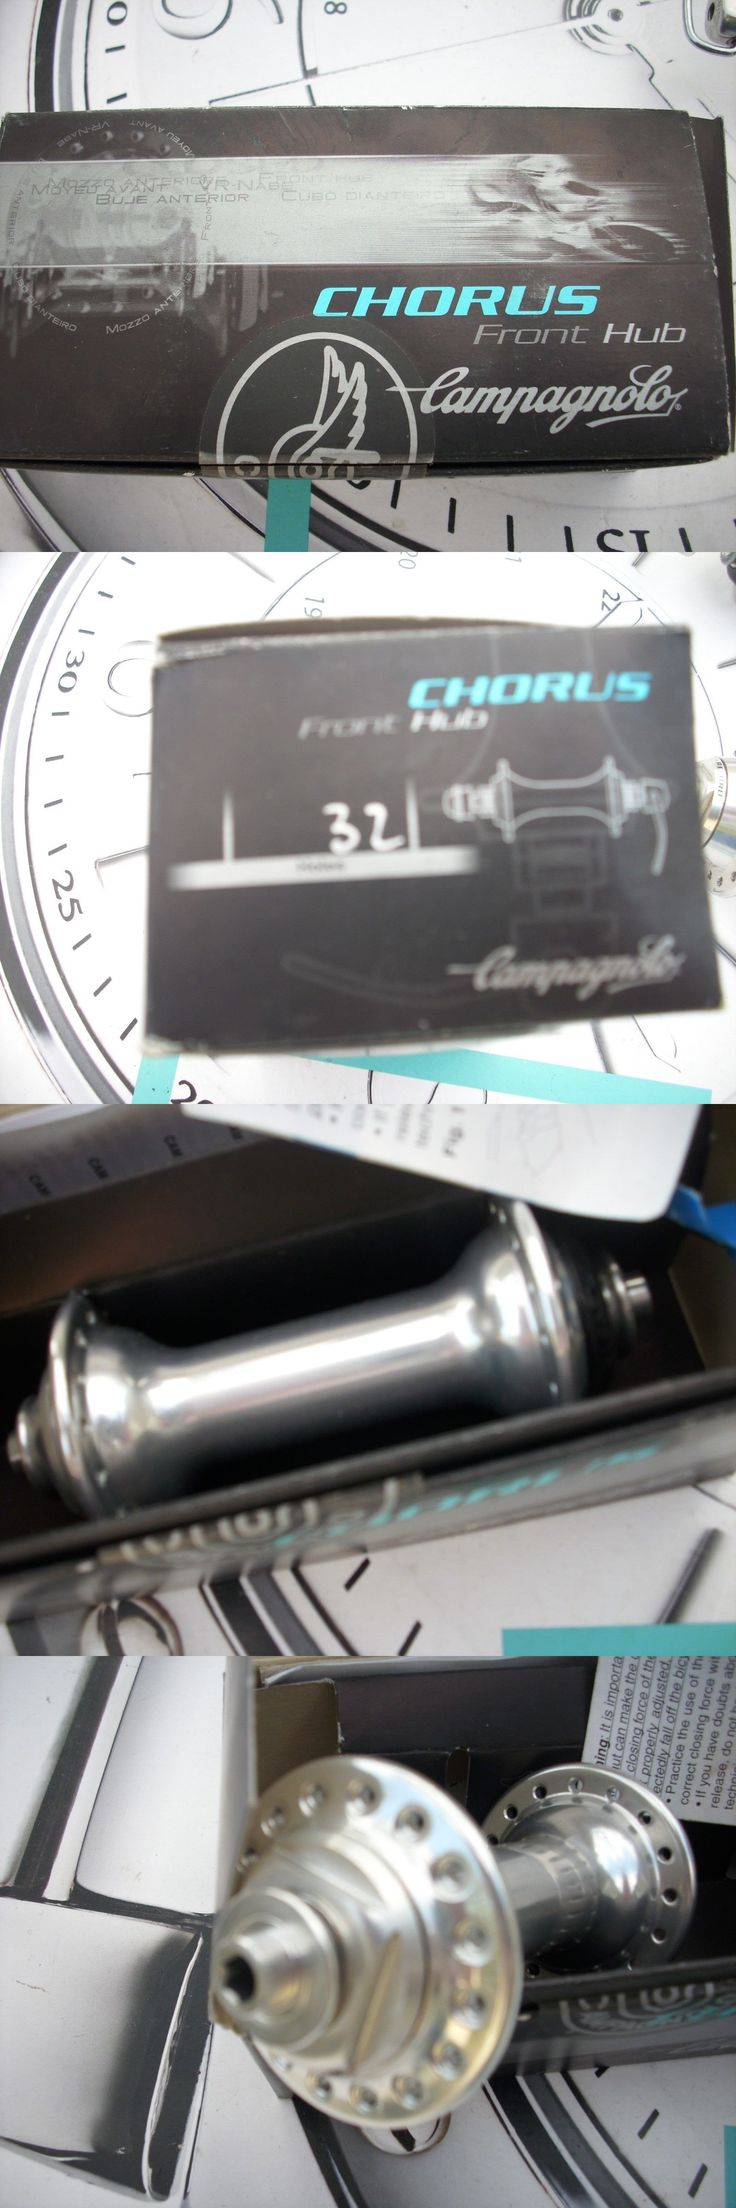 Hubs 177820: Nib Campagnolo Chorus 32H 10Spd F Hub Wqr Merckx Colnago Campy De Rosa Masi -> BUY IT NOW ONLY: $105 on eBay!